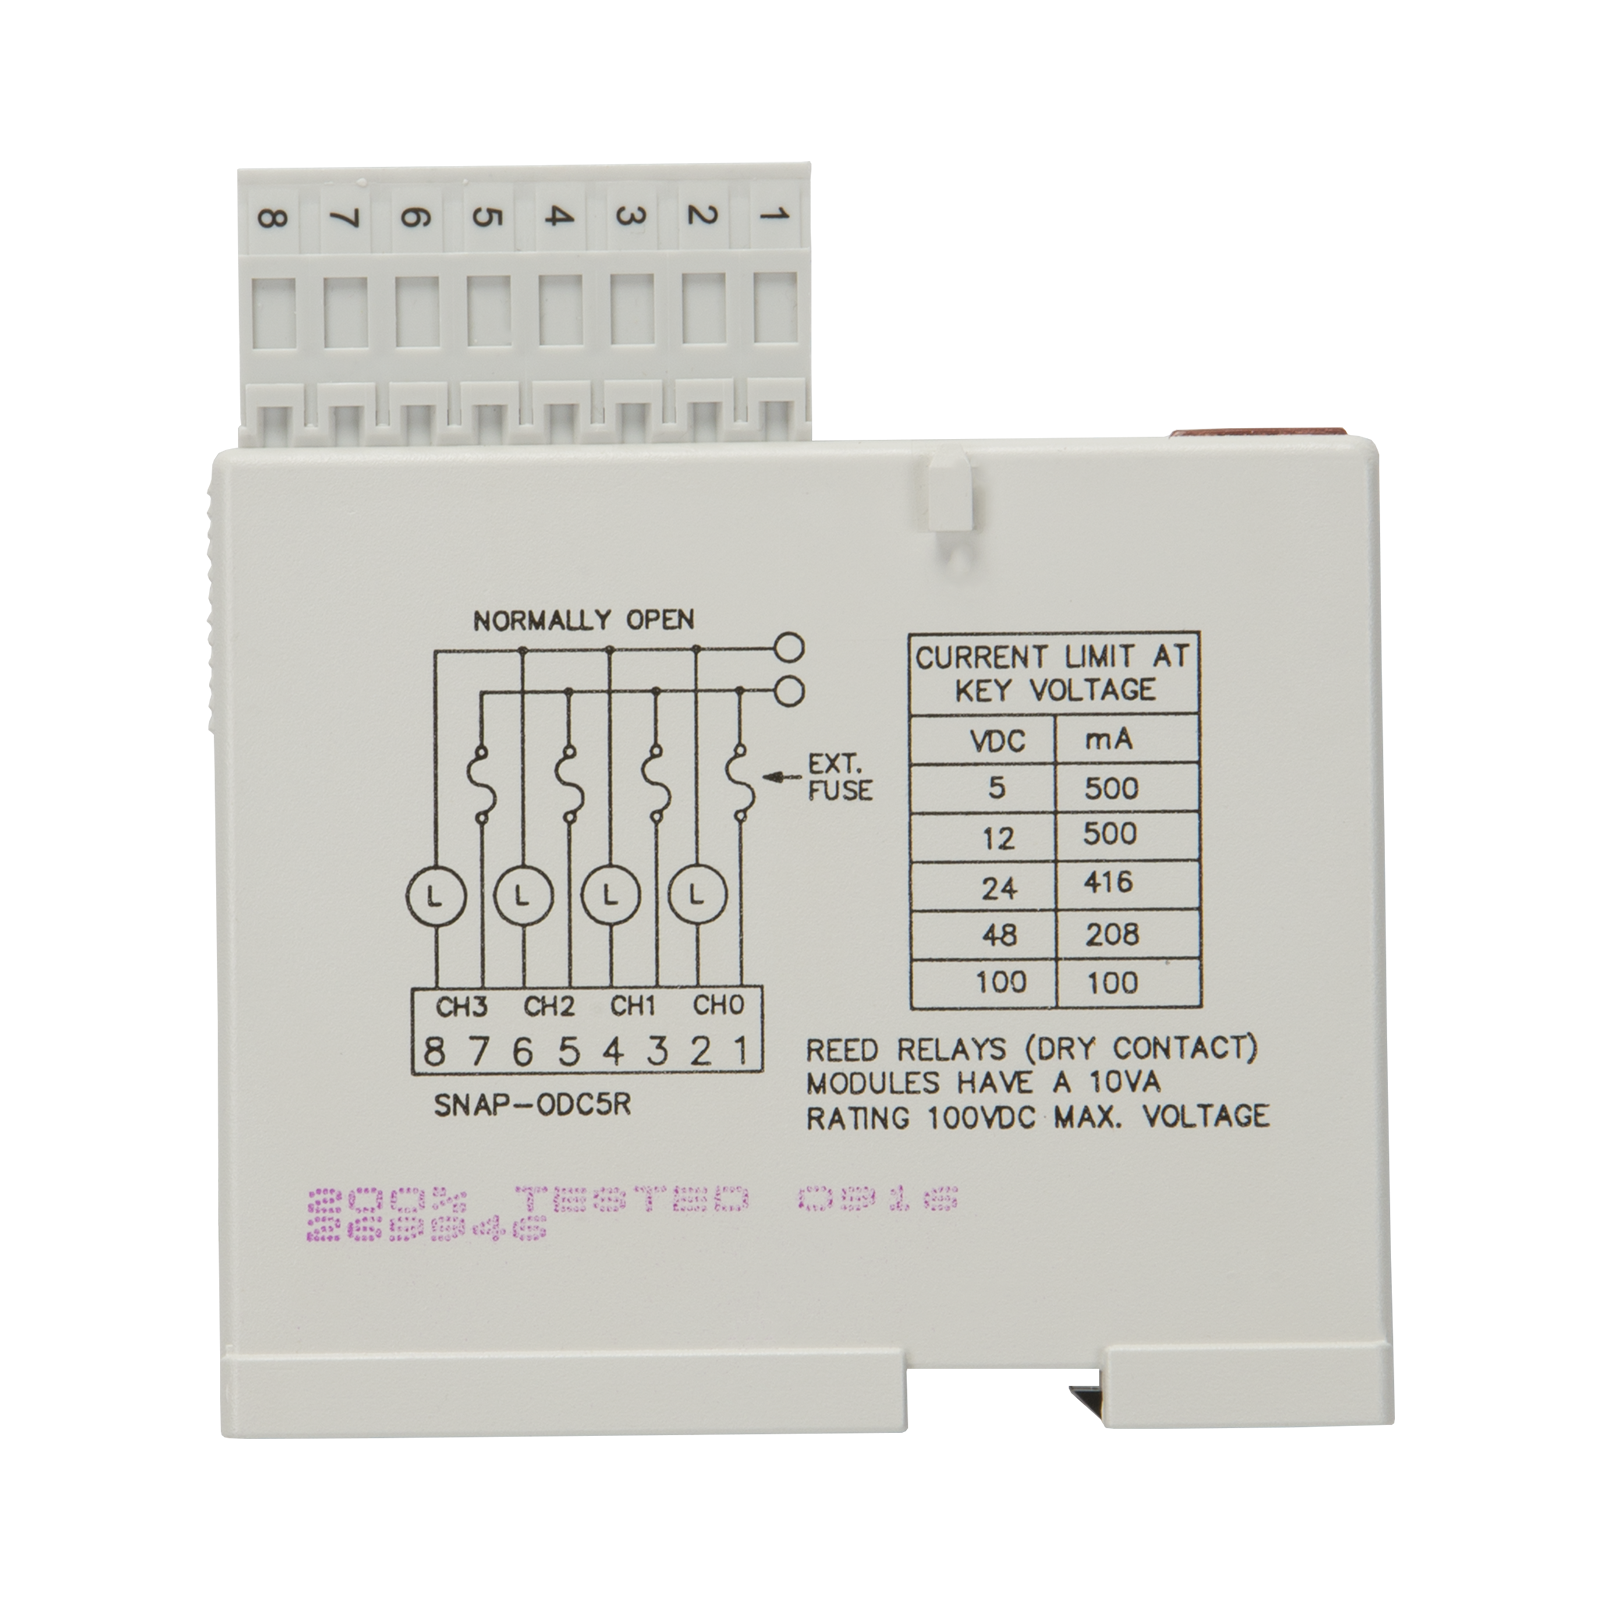 [SCHEMATICS_48DE]  MY_2994] Opto 22 Relay Wiring Diagram Schematic Wiring | Opto 22 Ssr Wiring Diagram |  | Xempag Rosz Cette Apan Pneu Tzici Rect Mohammedshrine Librar Wiring 101